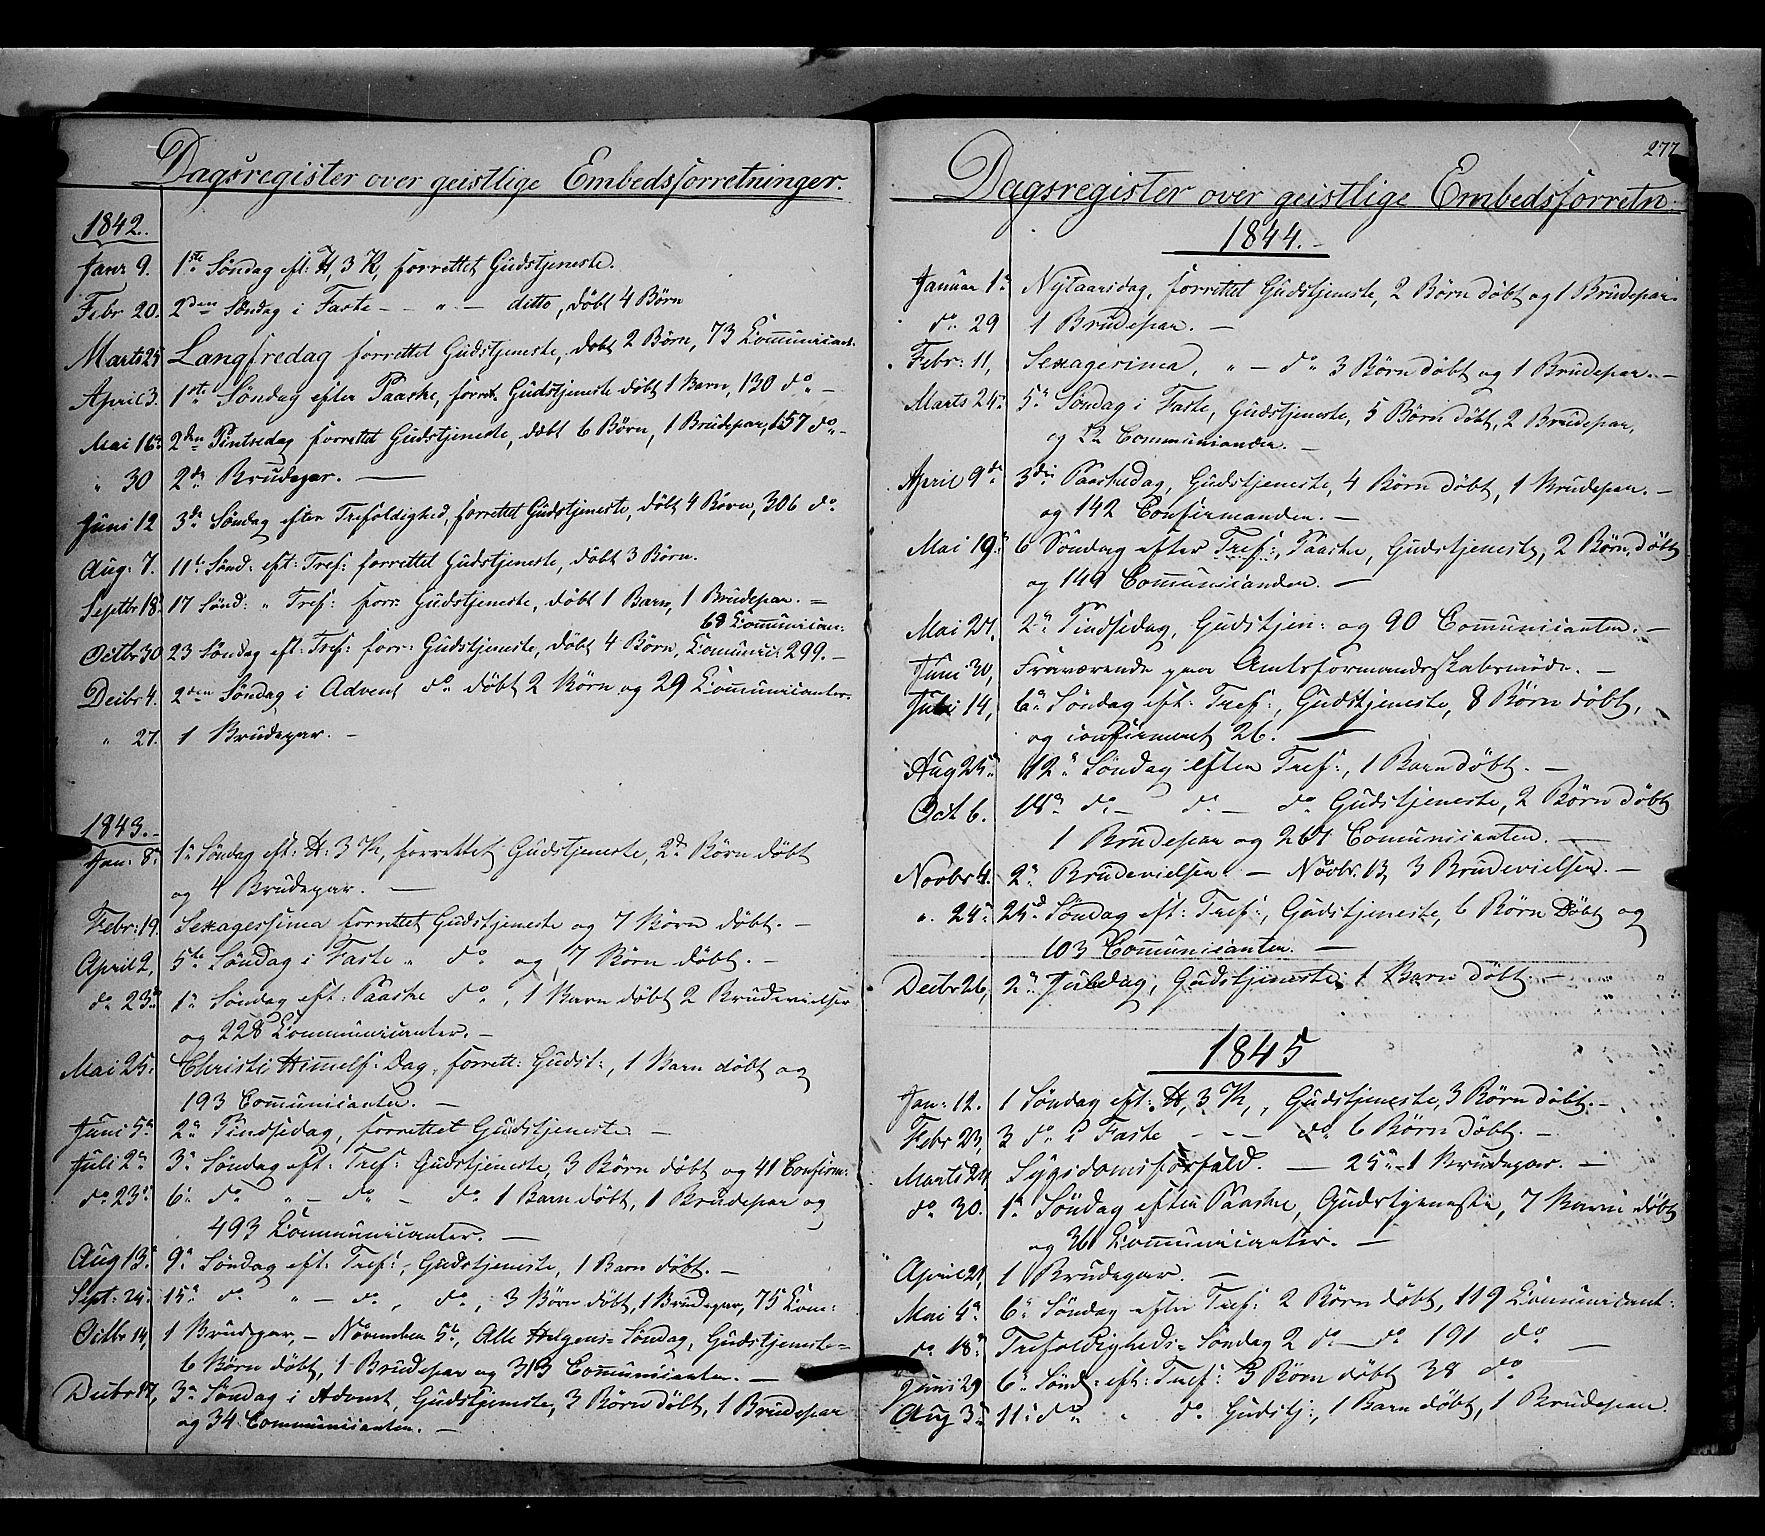 SAH, Nord-Aurdal prestekontor, Ministerialbok nr. 5, 1842-1863, s. 277